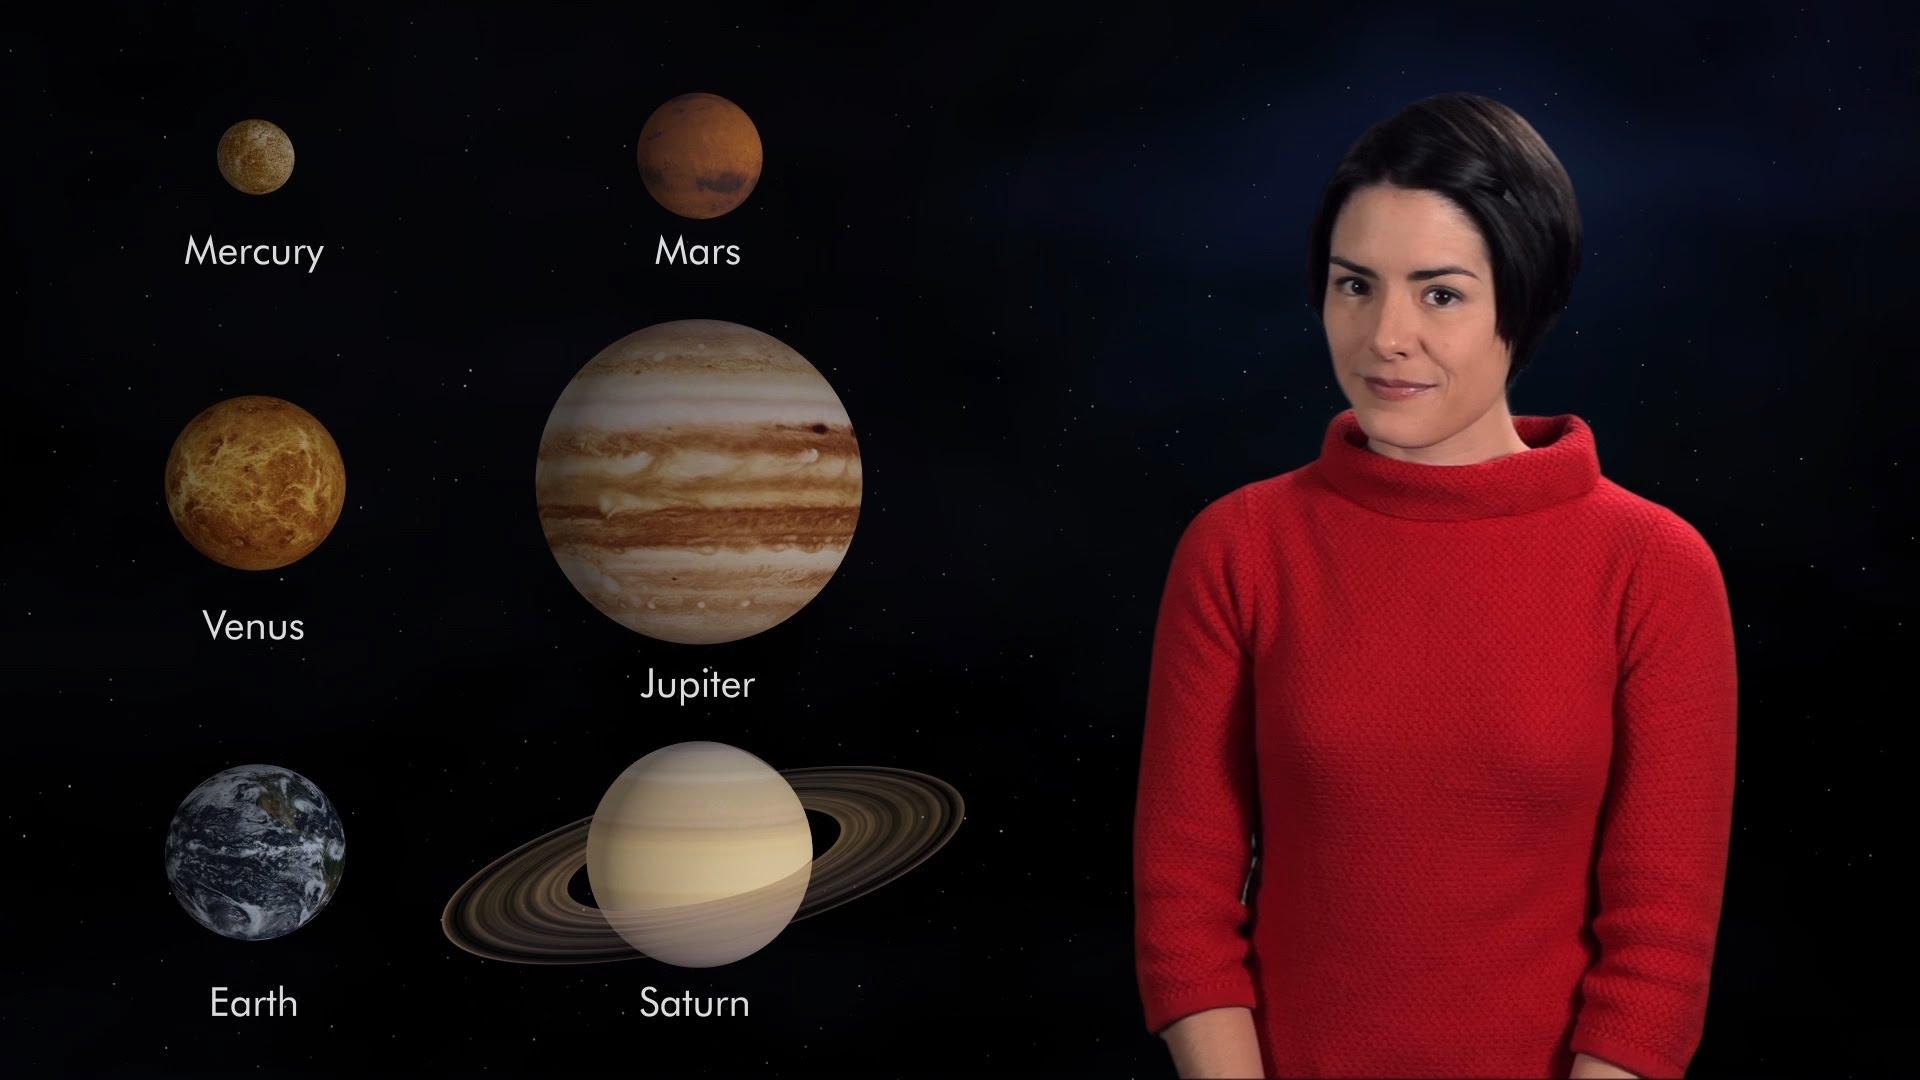 Uranus (Planet) - Discovery